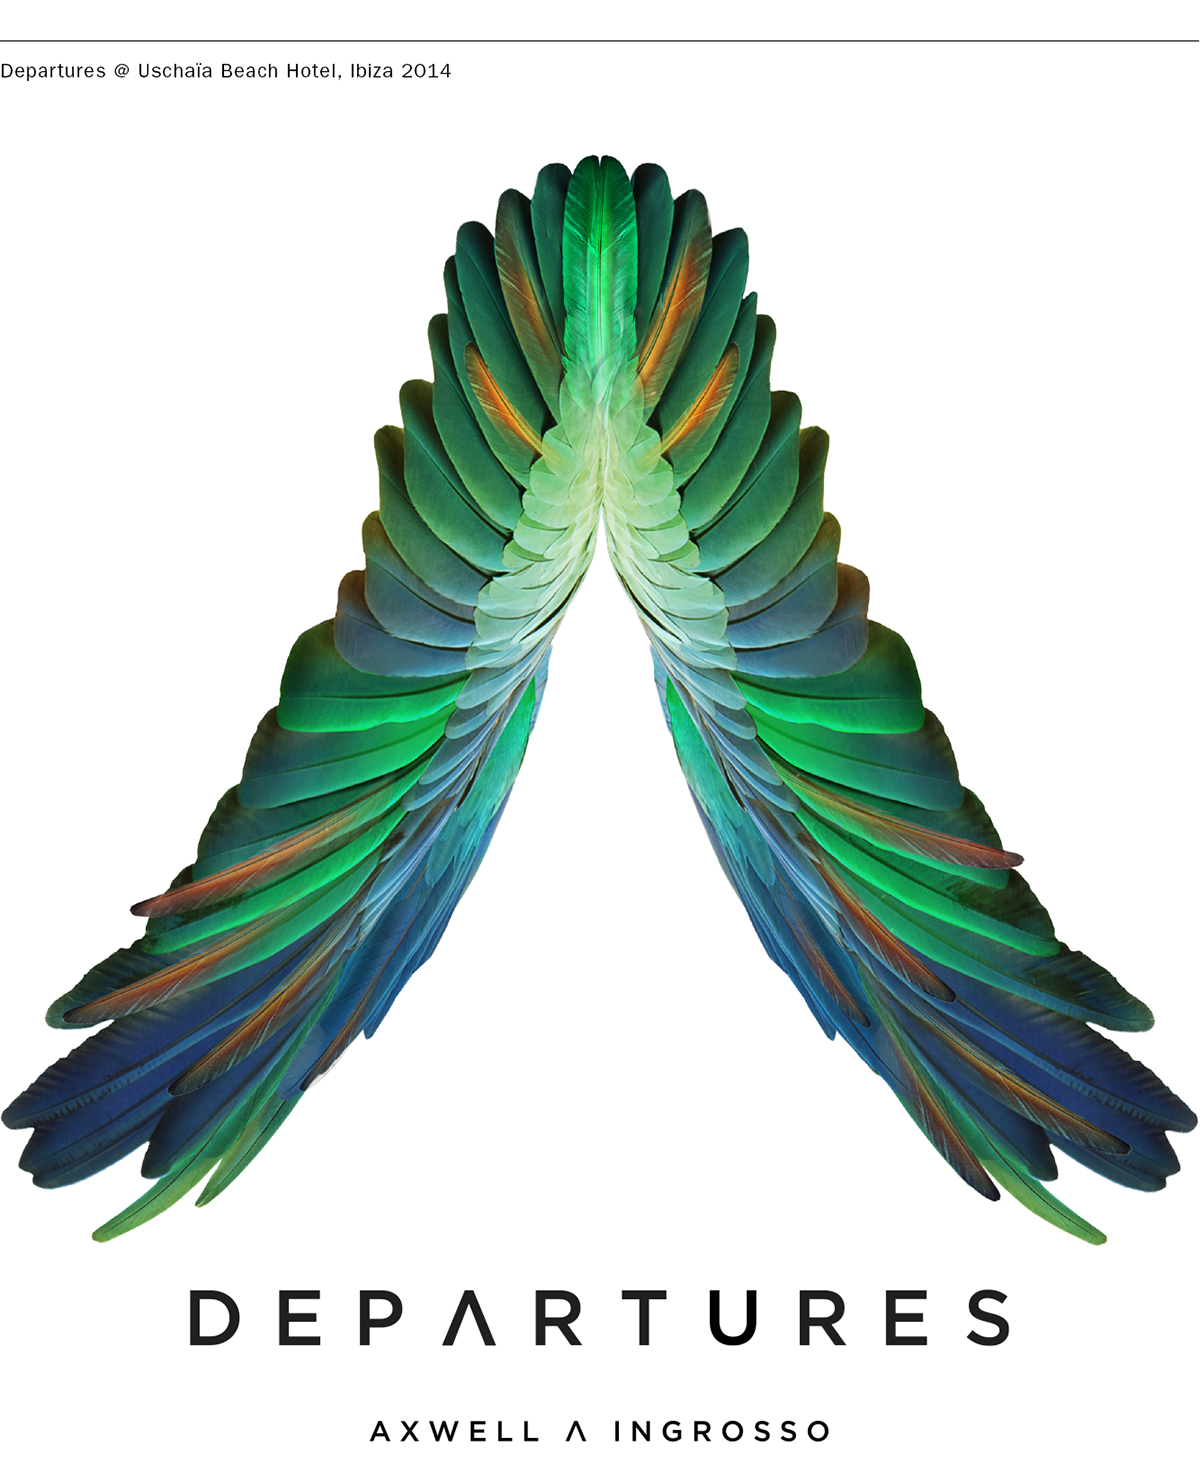 axwell ingrosso departures ibiza 2014 on behance